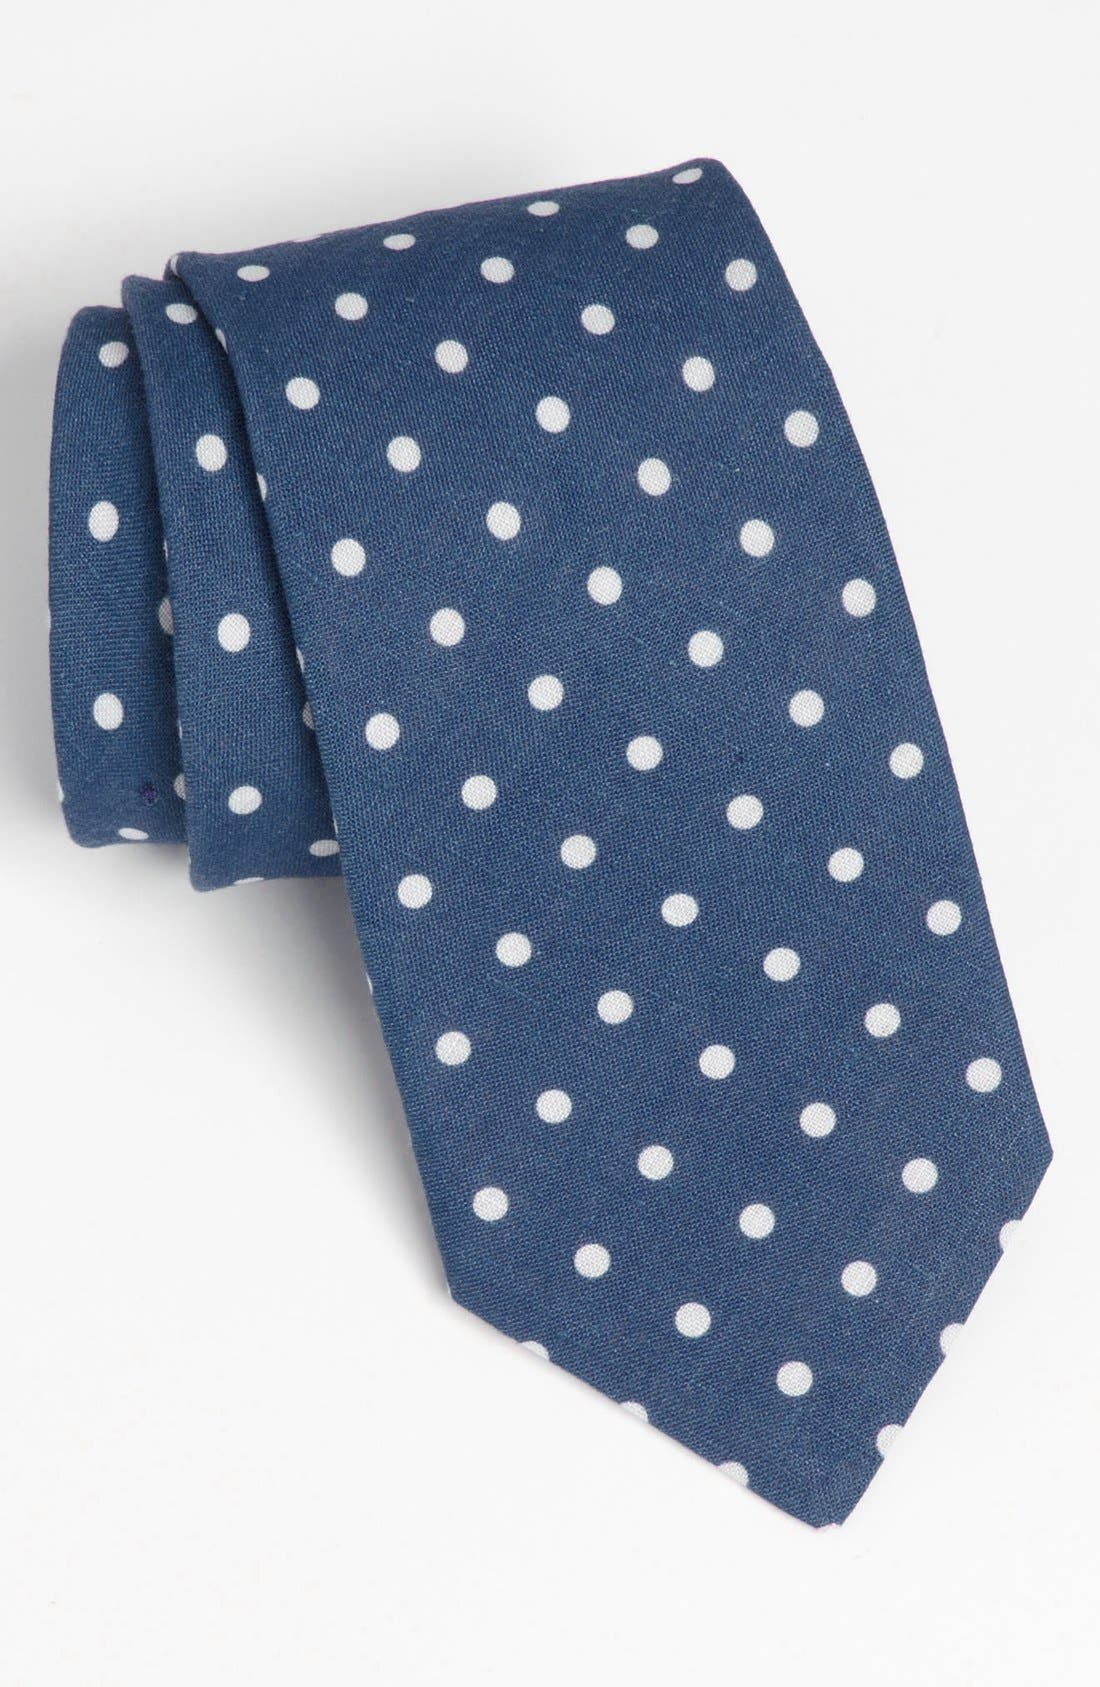 Alternate Image 1 Selected - Ted Baker London Woven Linen Tie